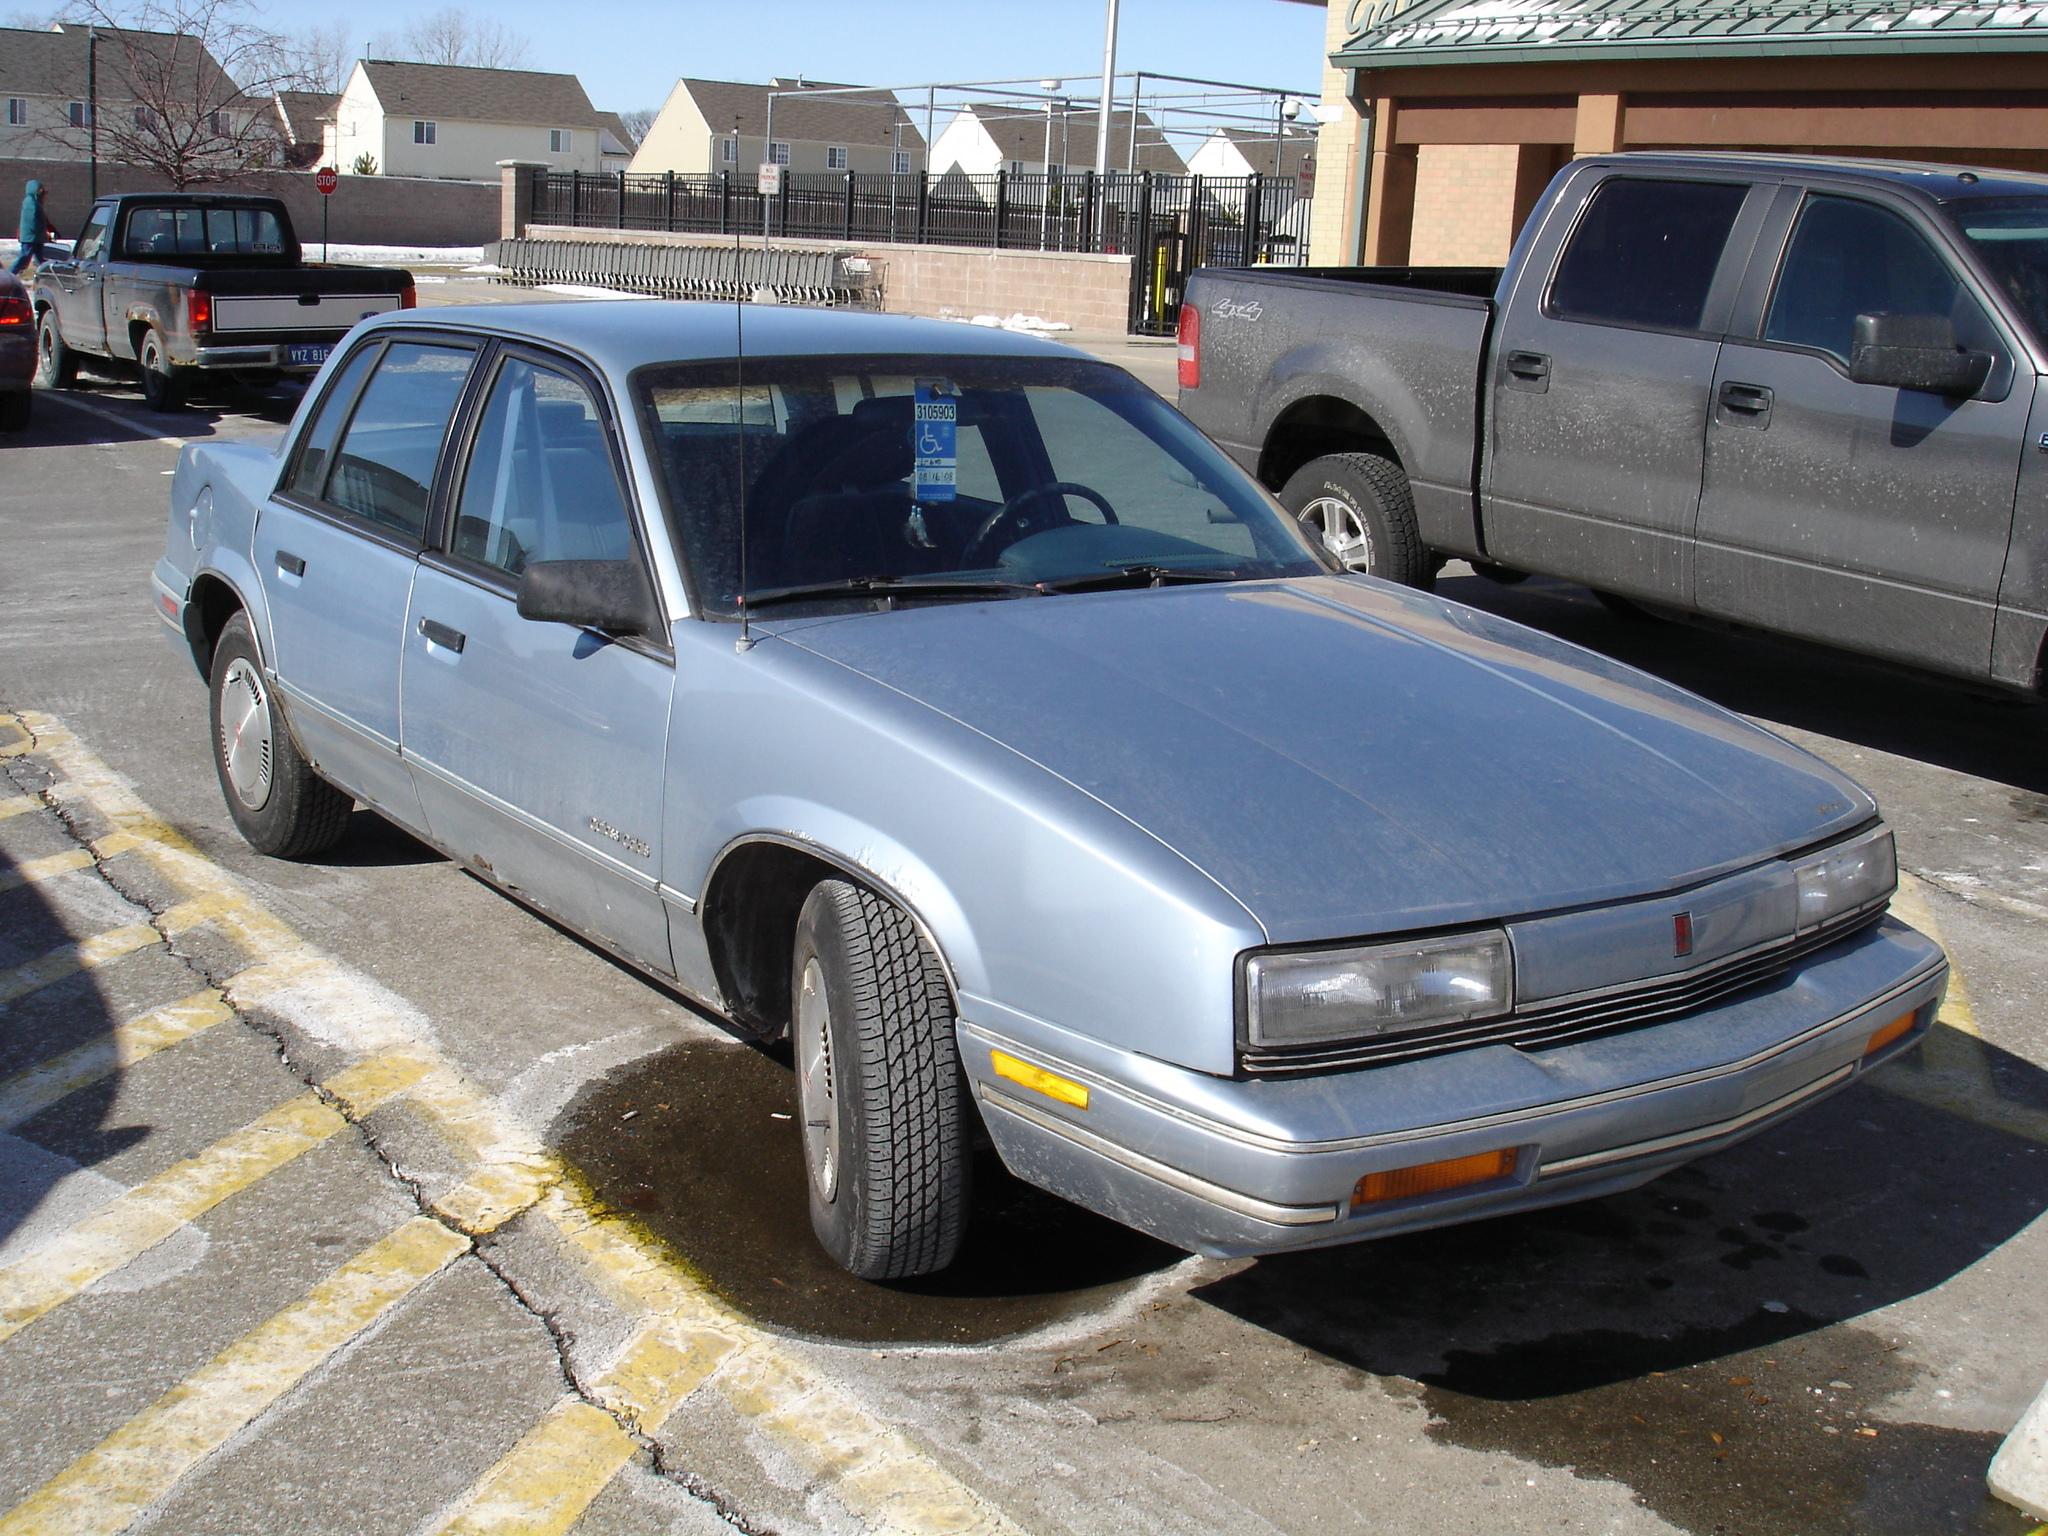 Fitxer:1989 Oldsmobile Cutlass Calais.jpg - Viquipèdia